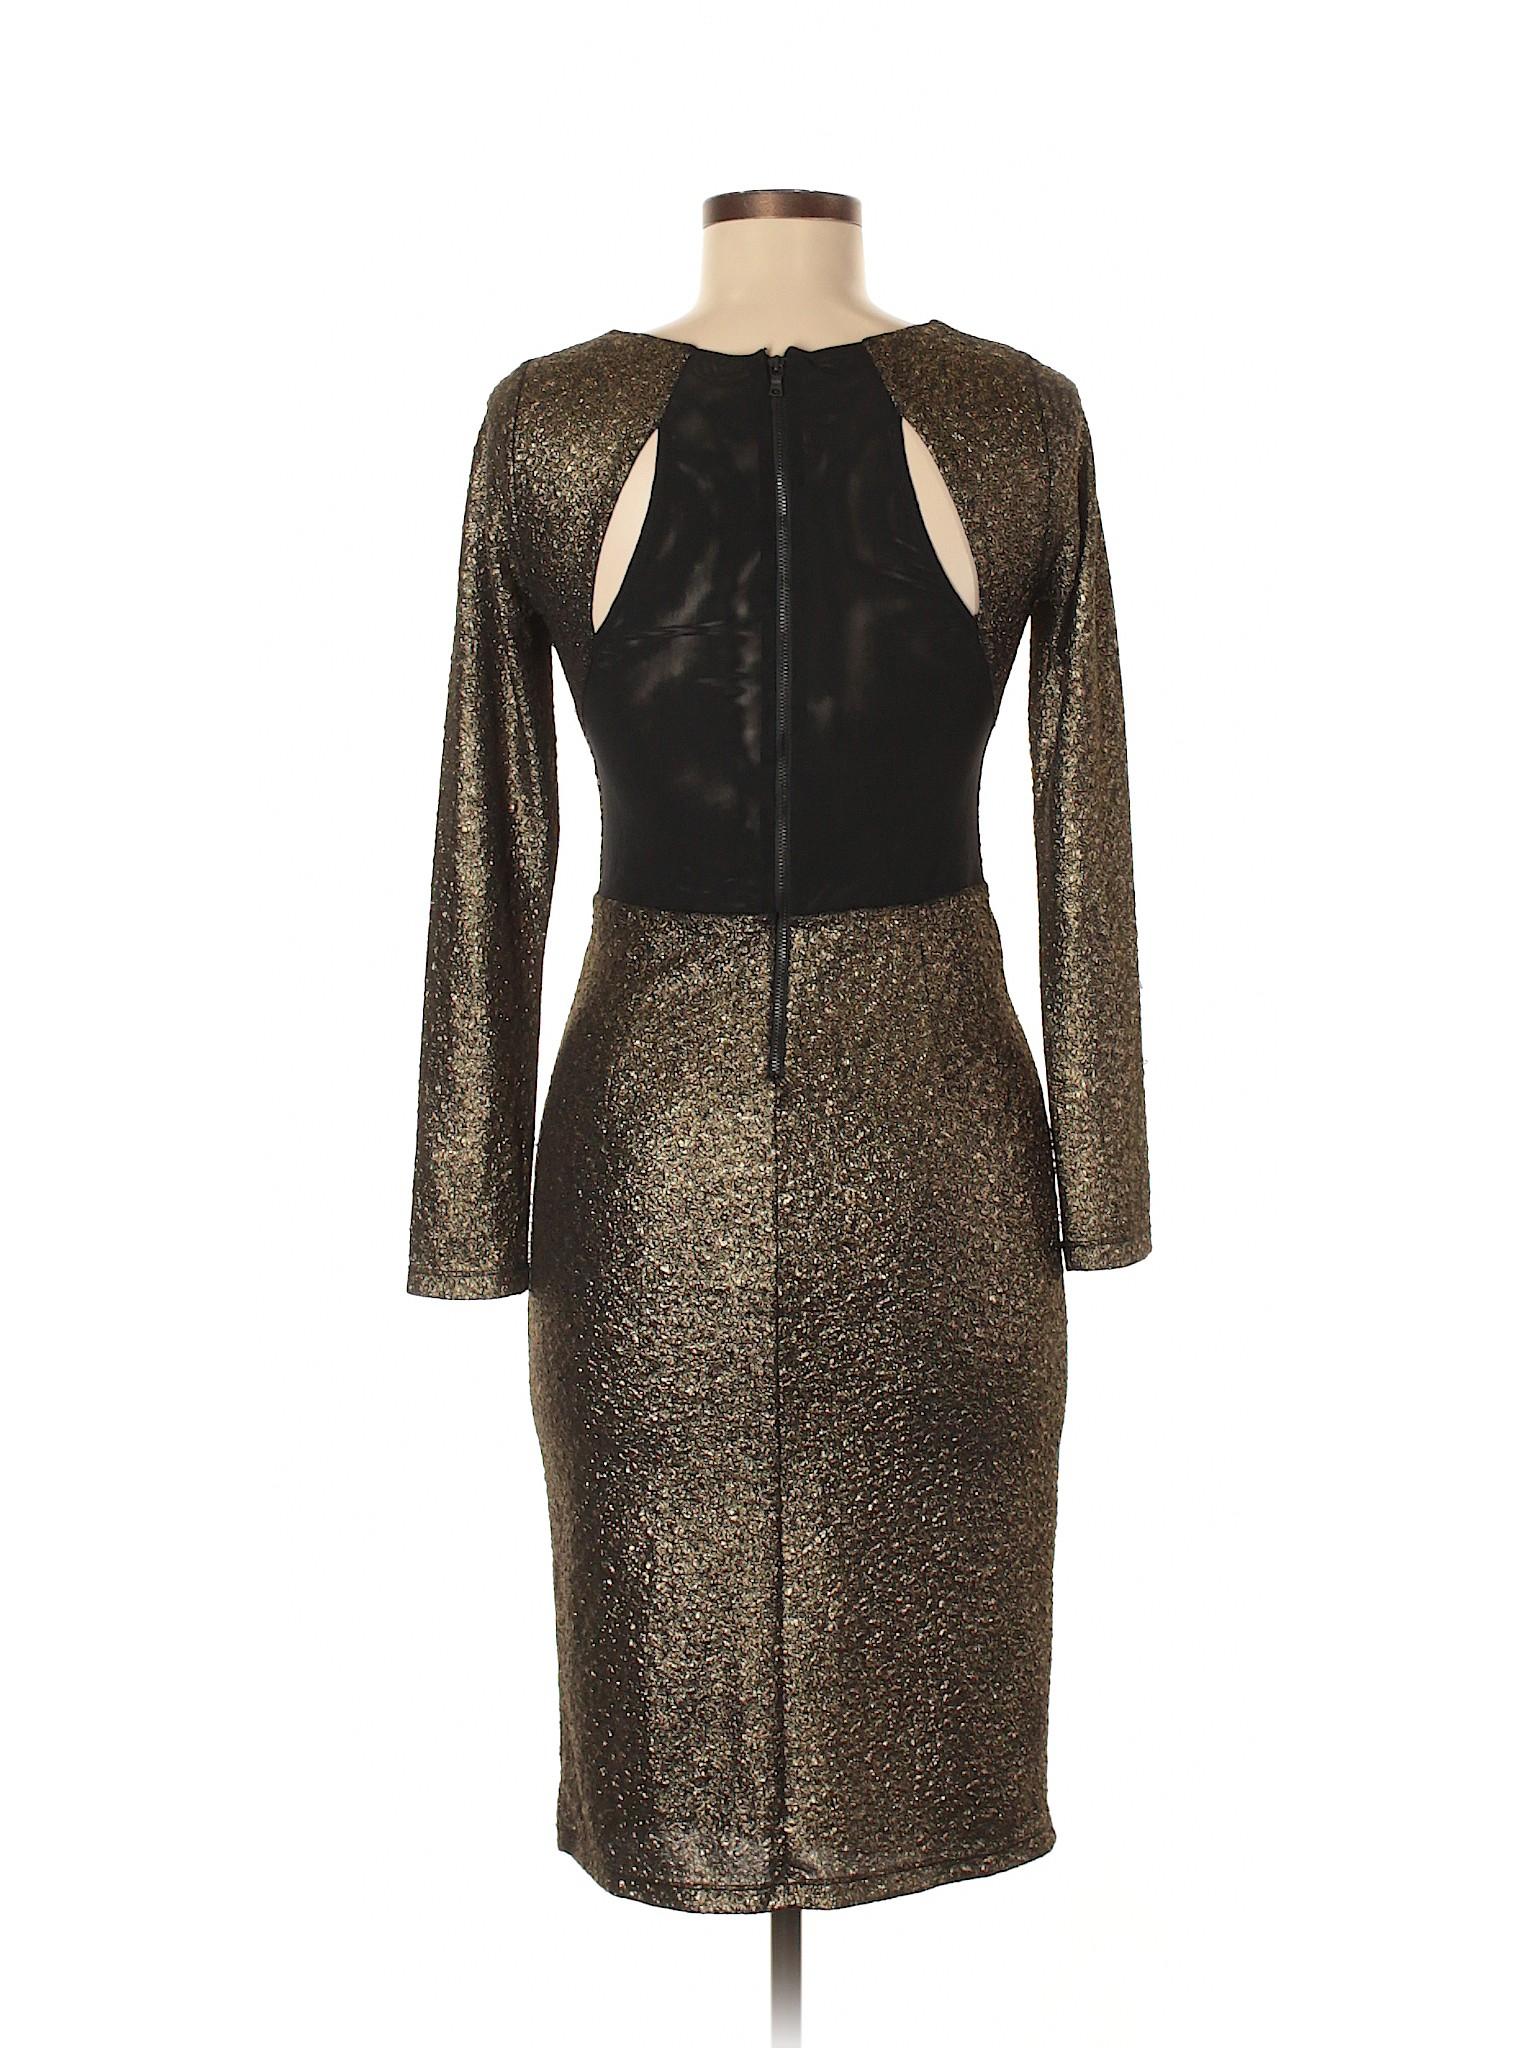 Cocktail winter Boutique alice Dress olivia 8PqxwtxZA